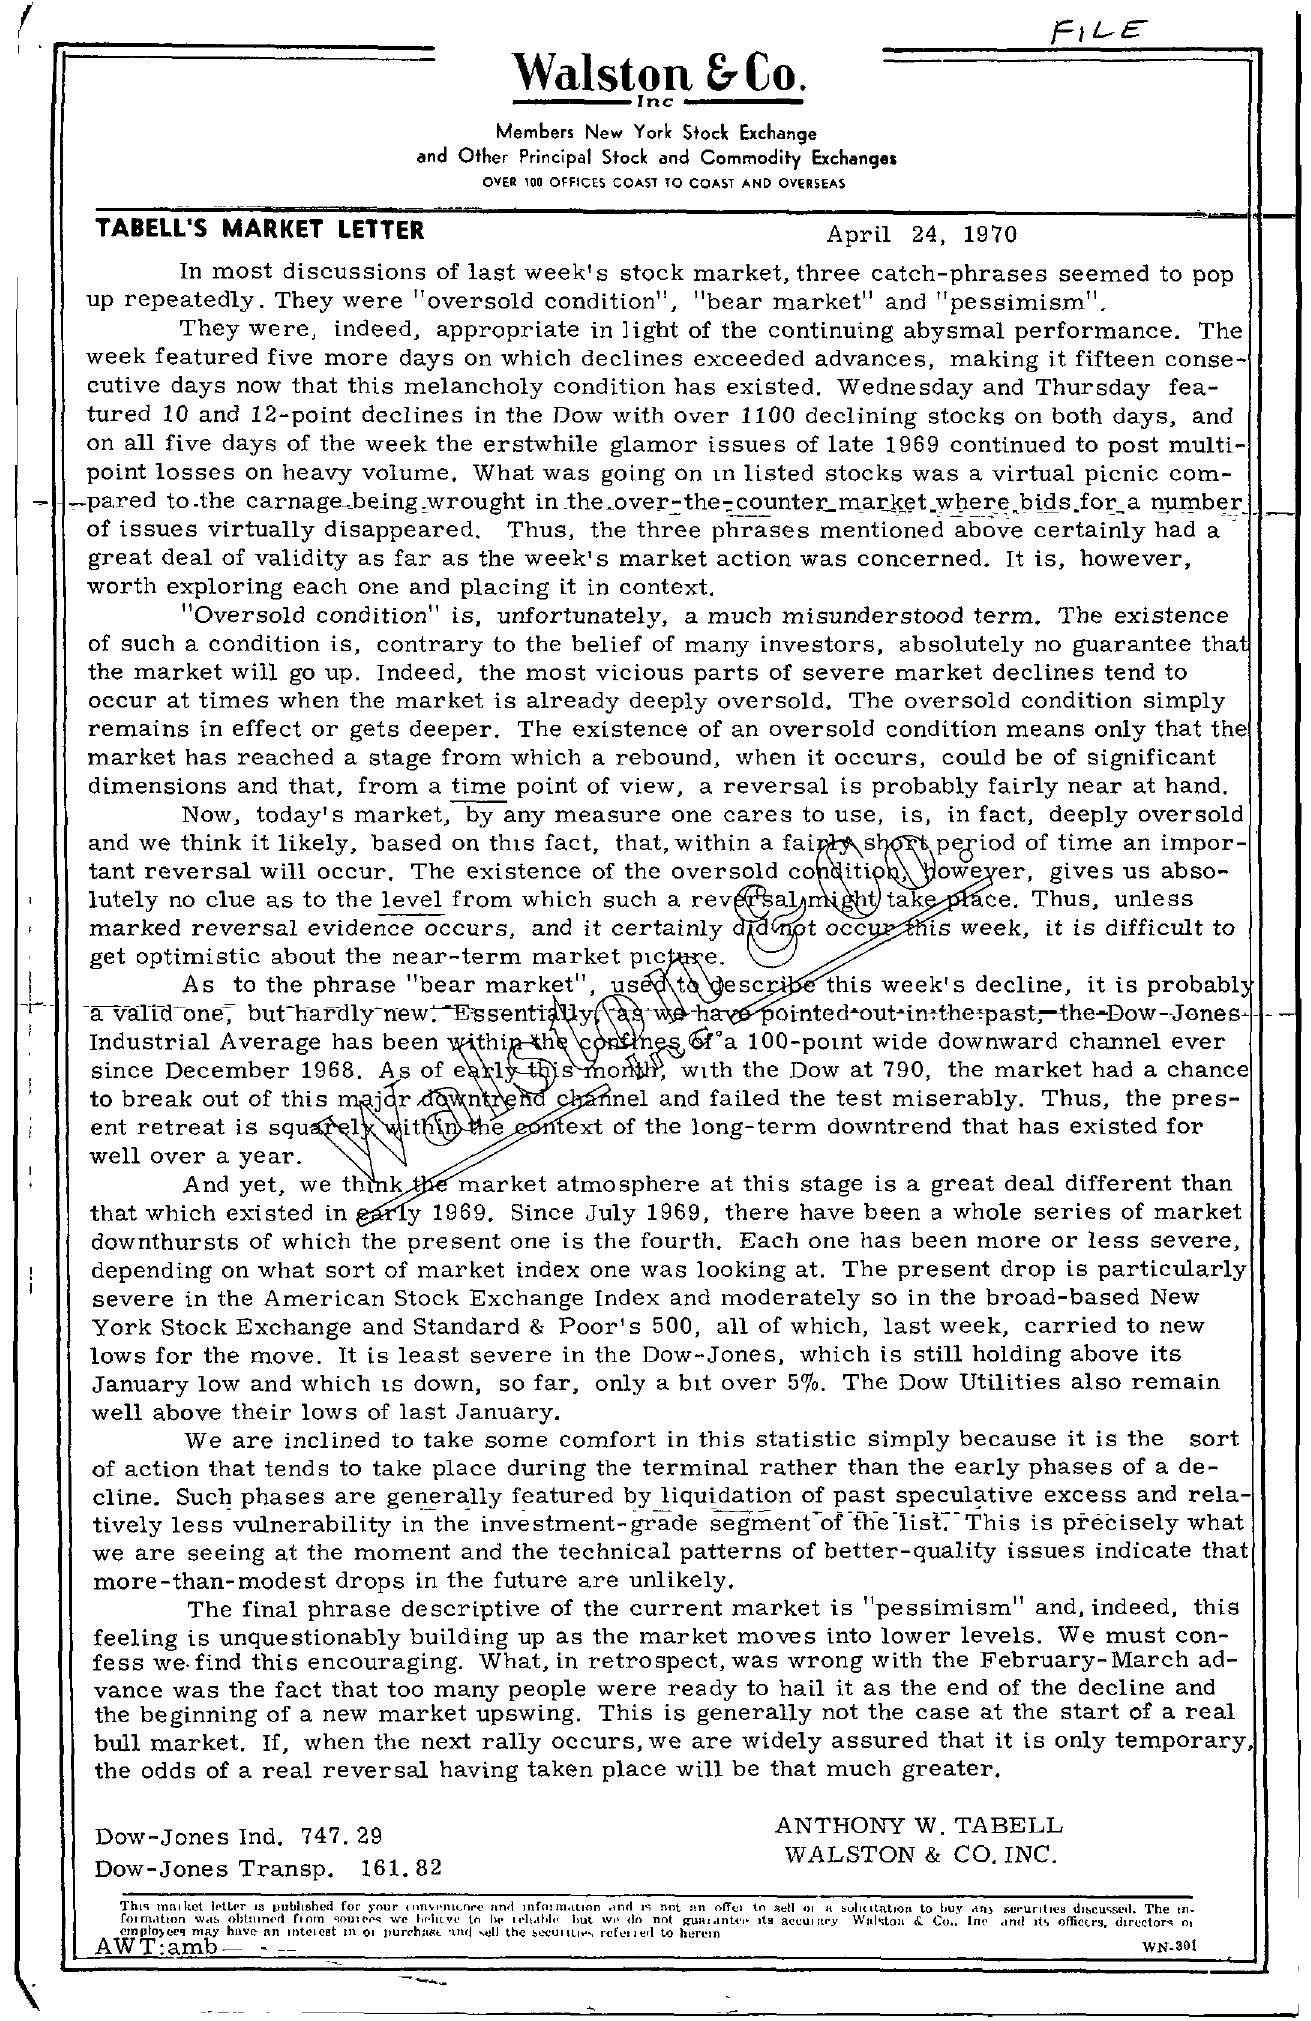 Tabell's Market Letter - April 24, 1970